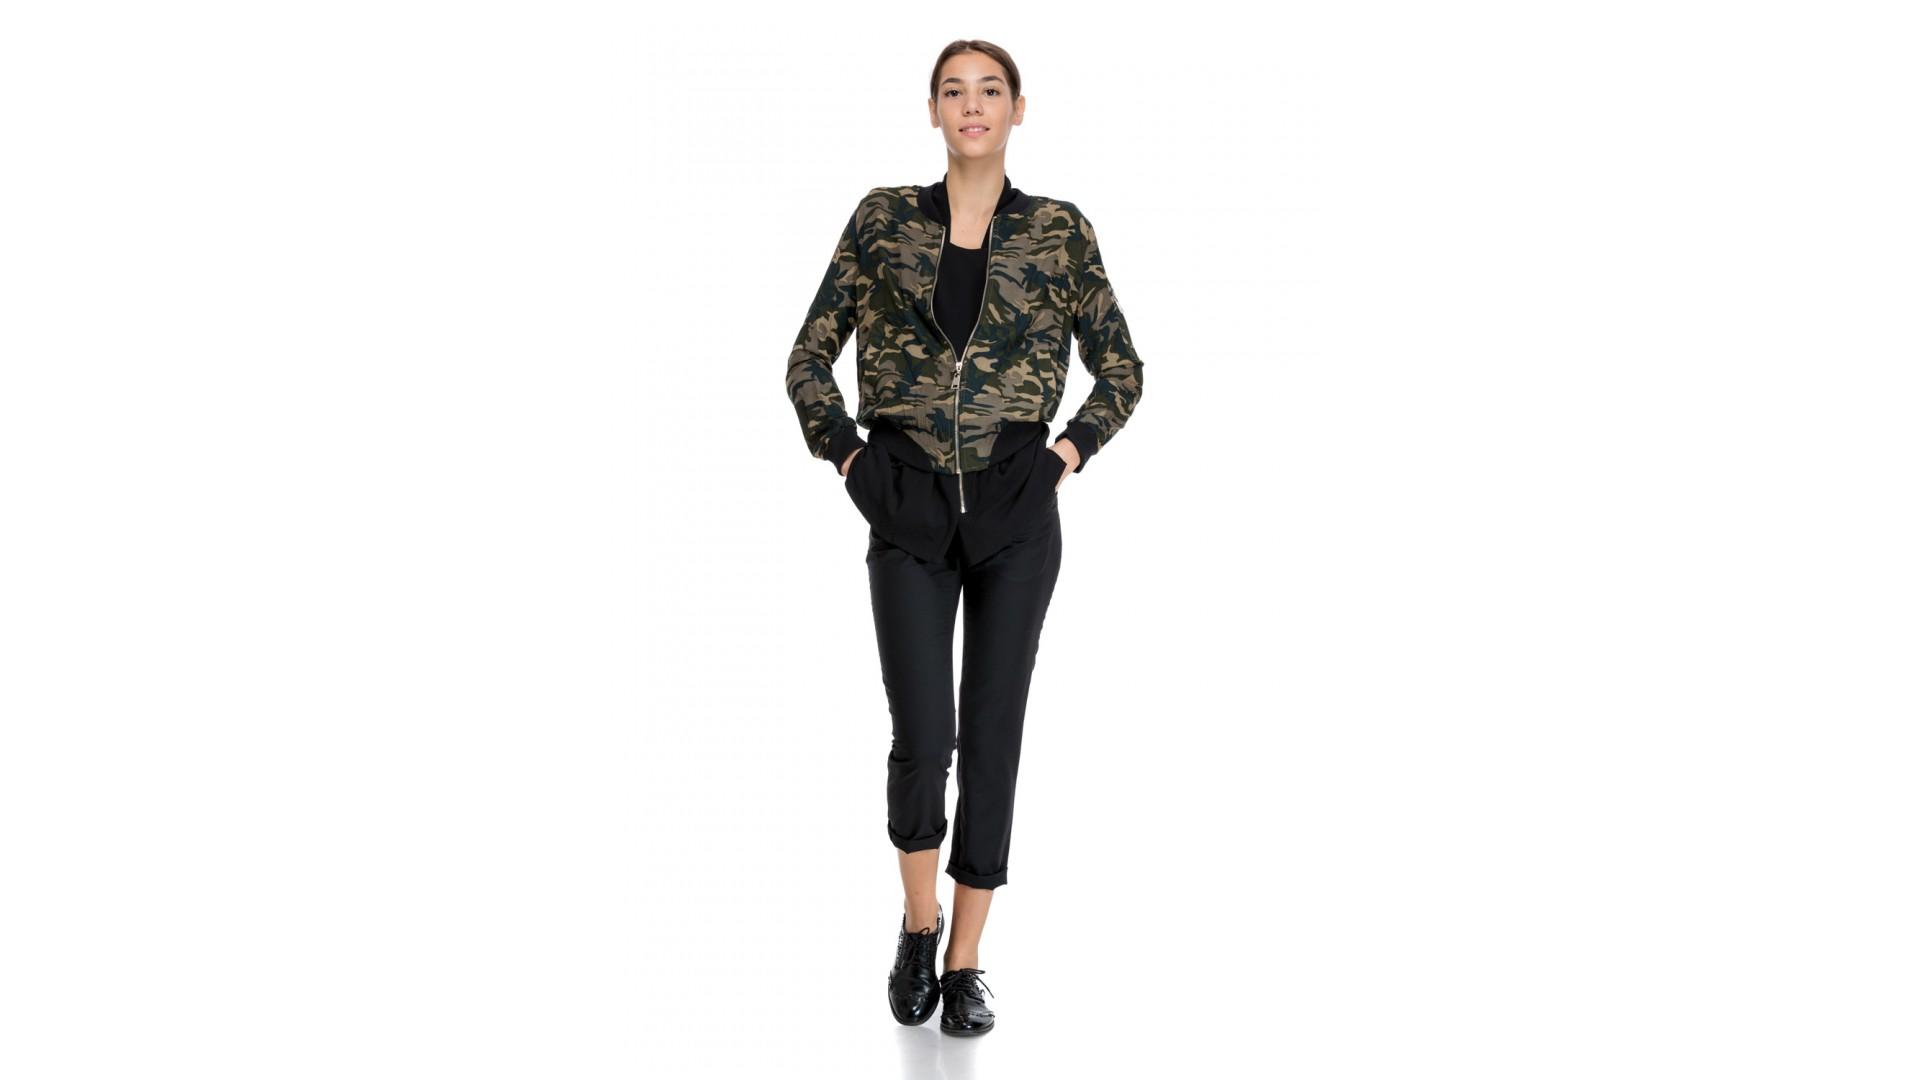 Jacheta Outwear 3 - Camouflage